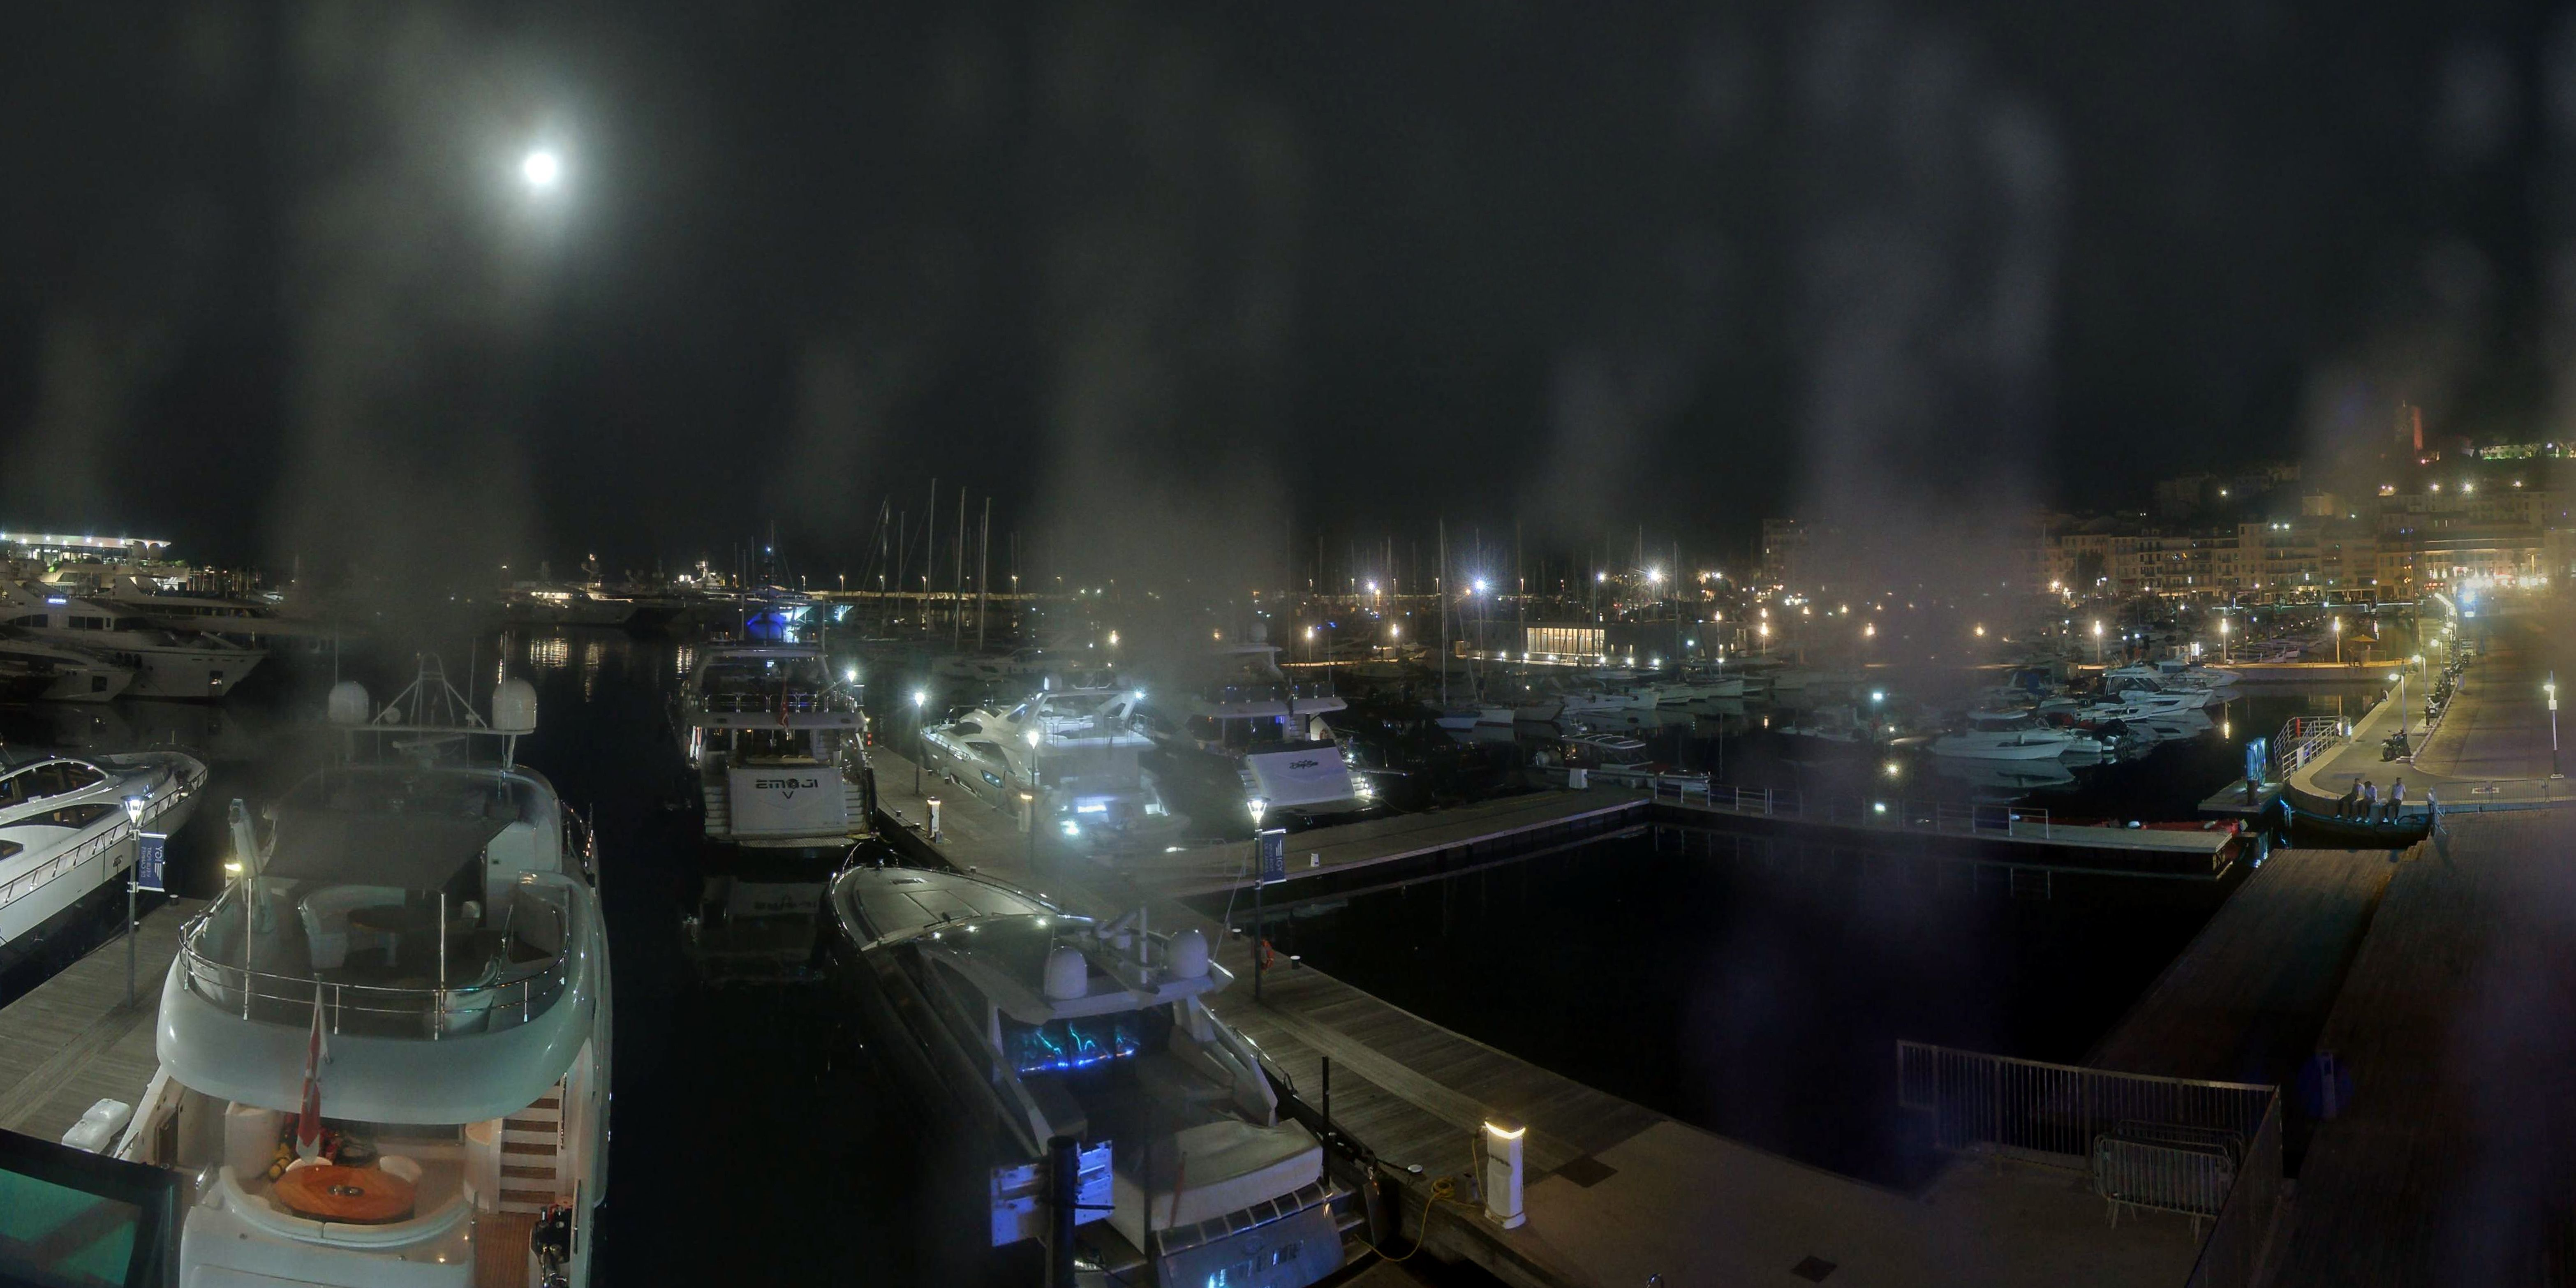 Cannes Thu. 02:35